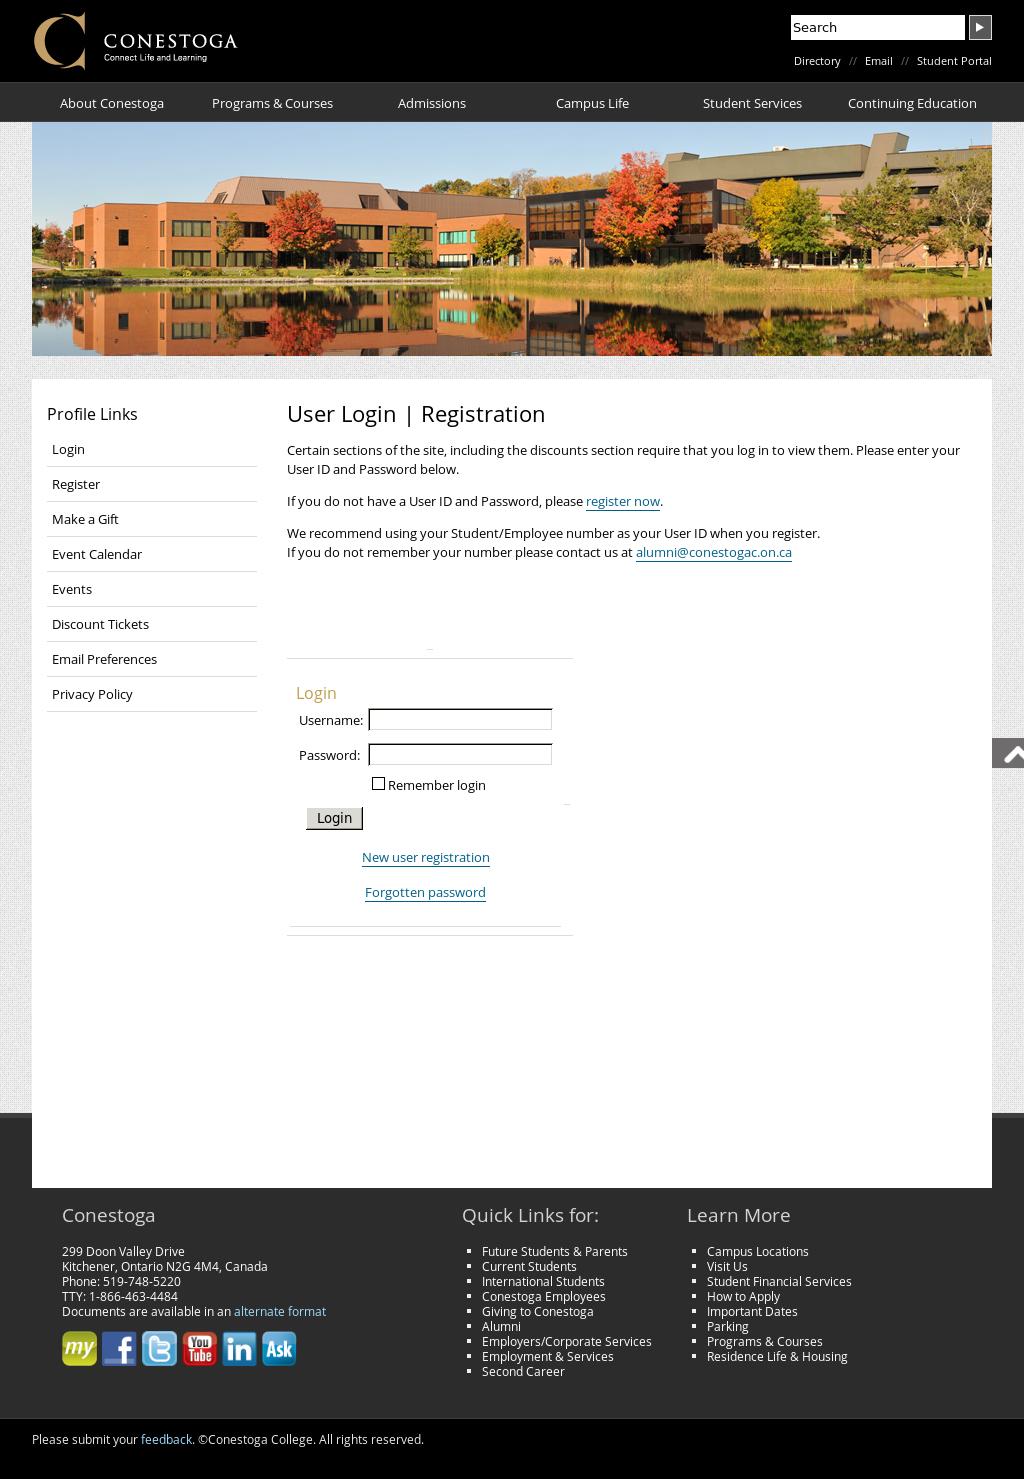 Conestoga College Competitors, Revenue and Employees - Owler Company ...